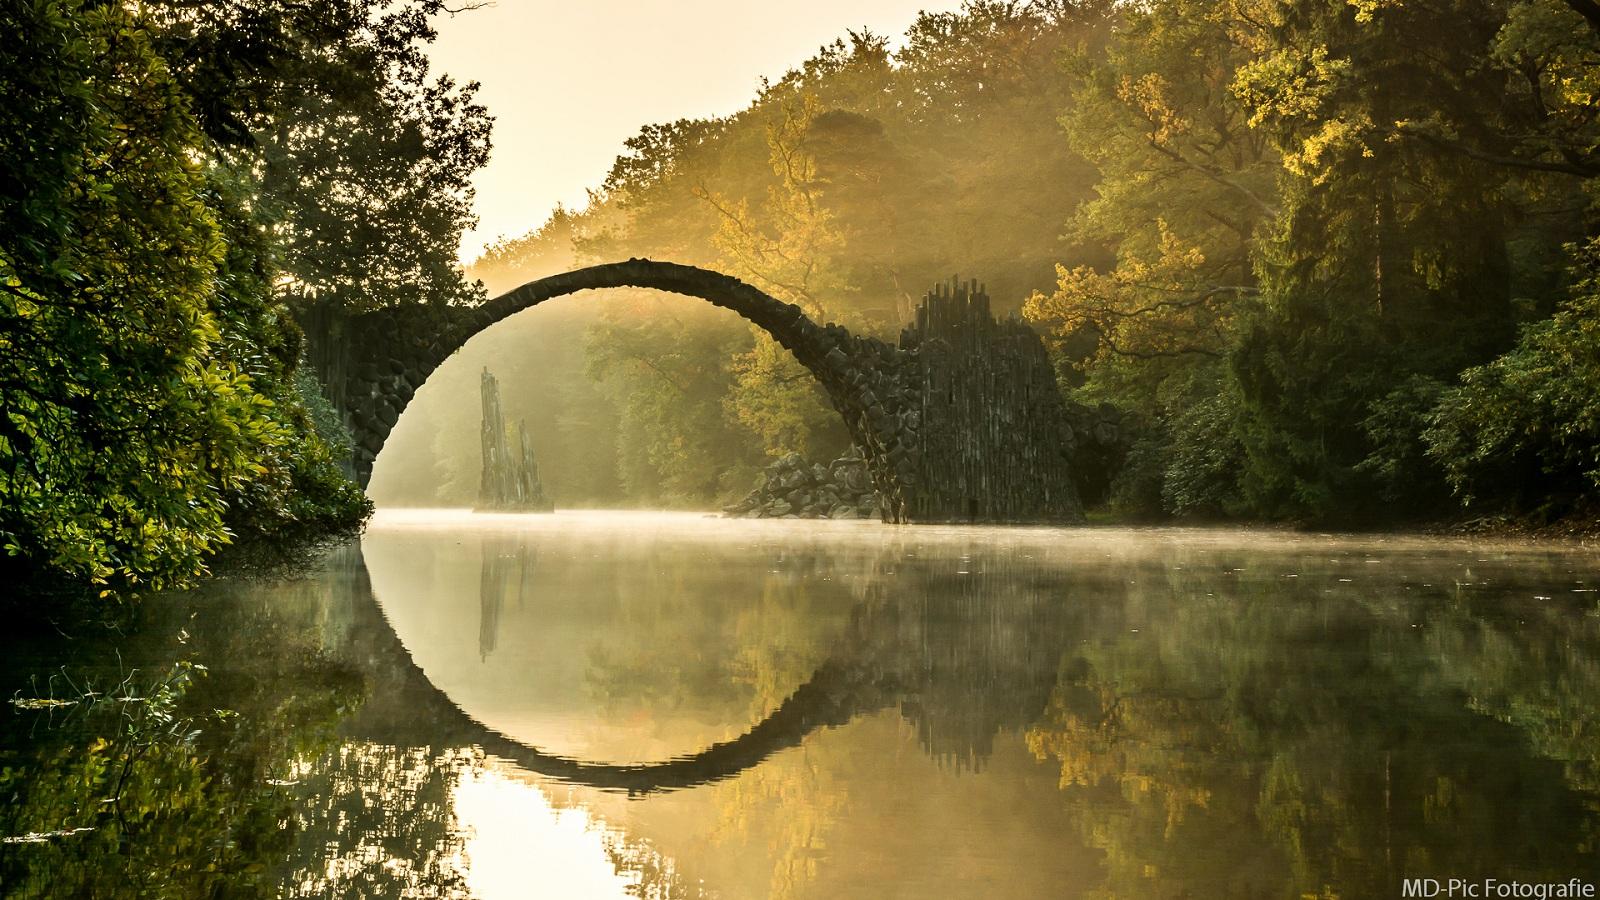 Fantasy Natural Stone Bridge Background